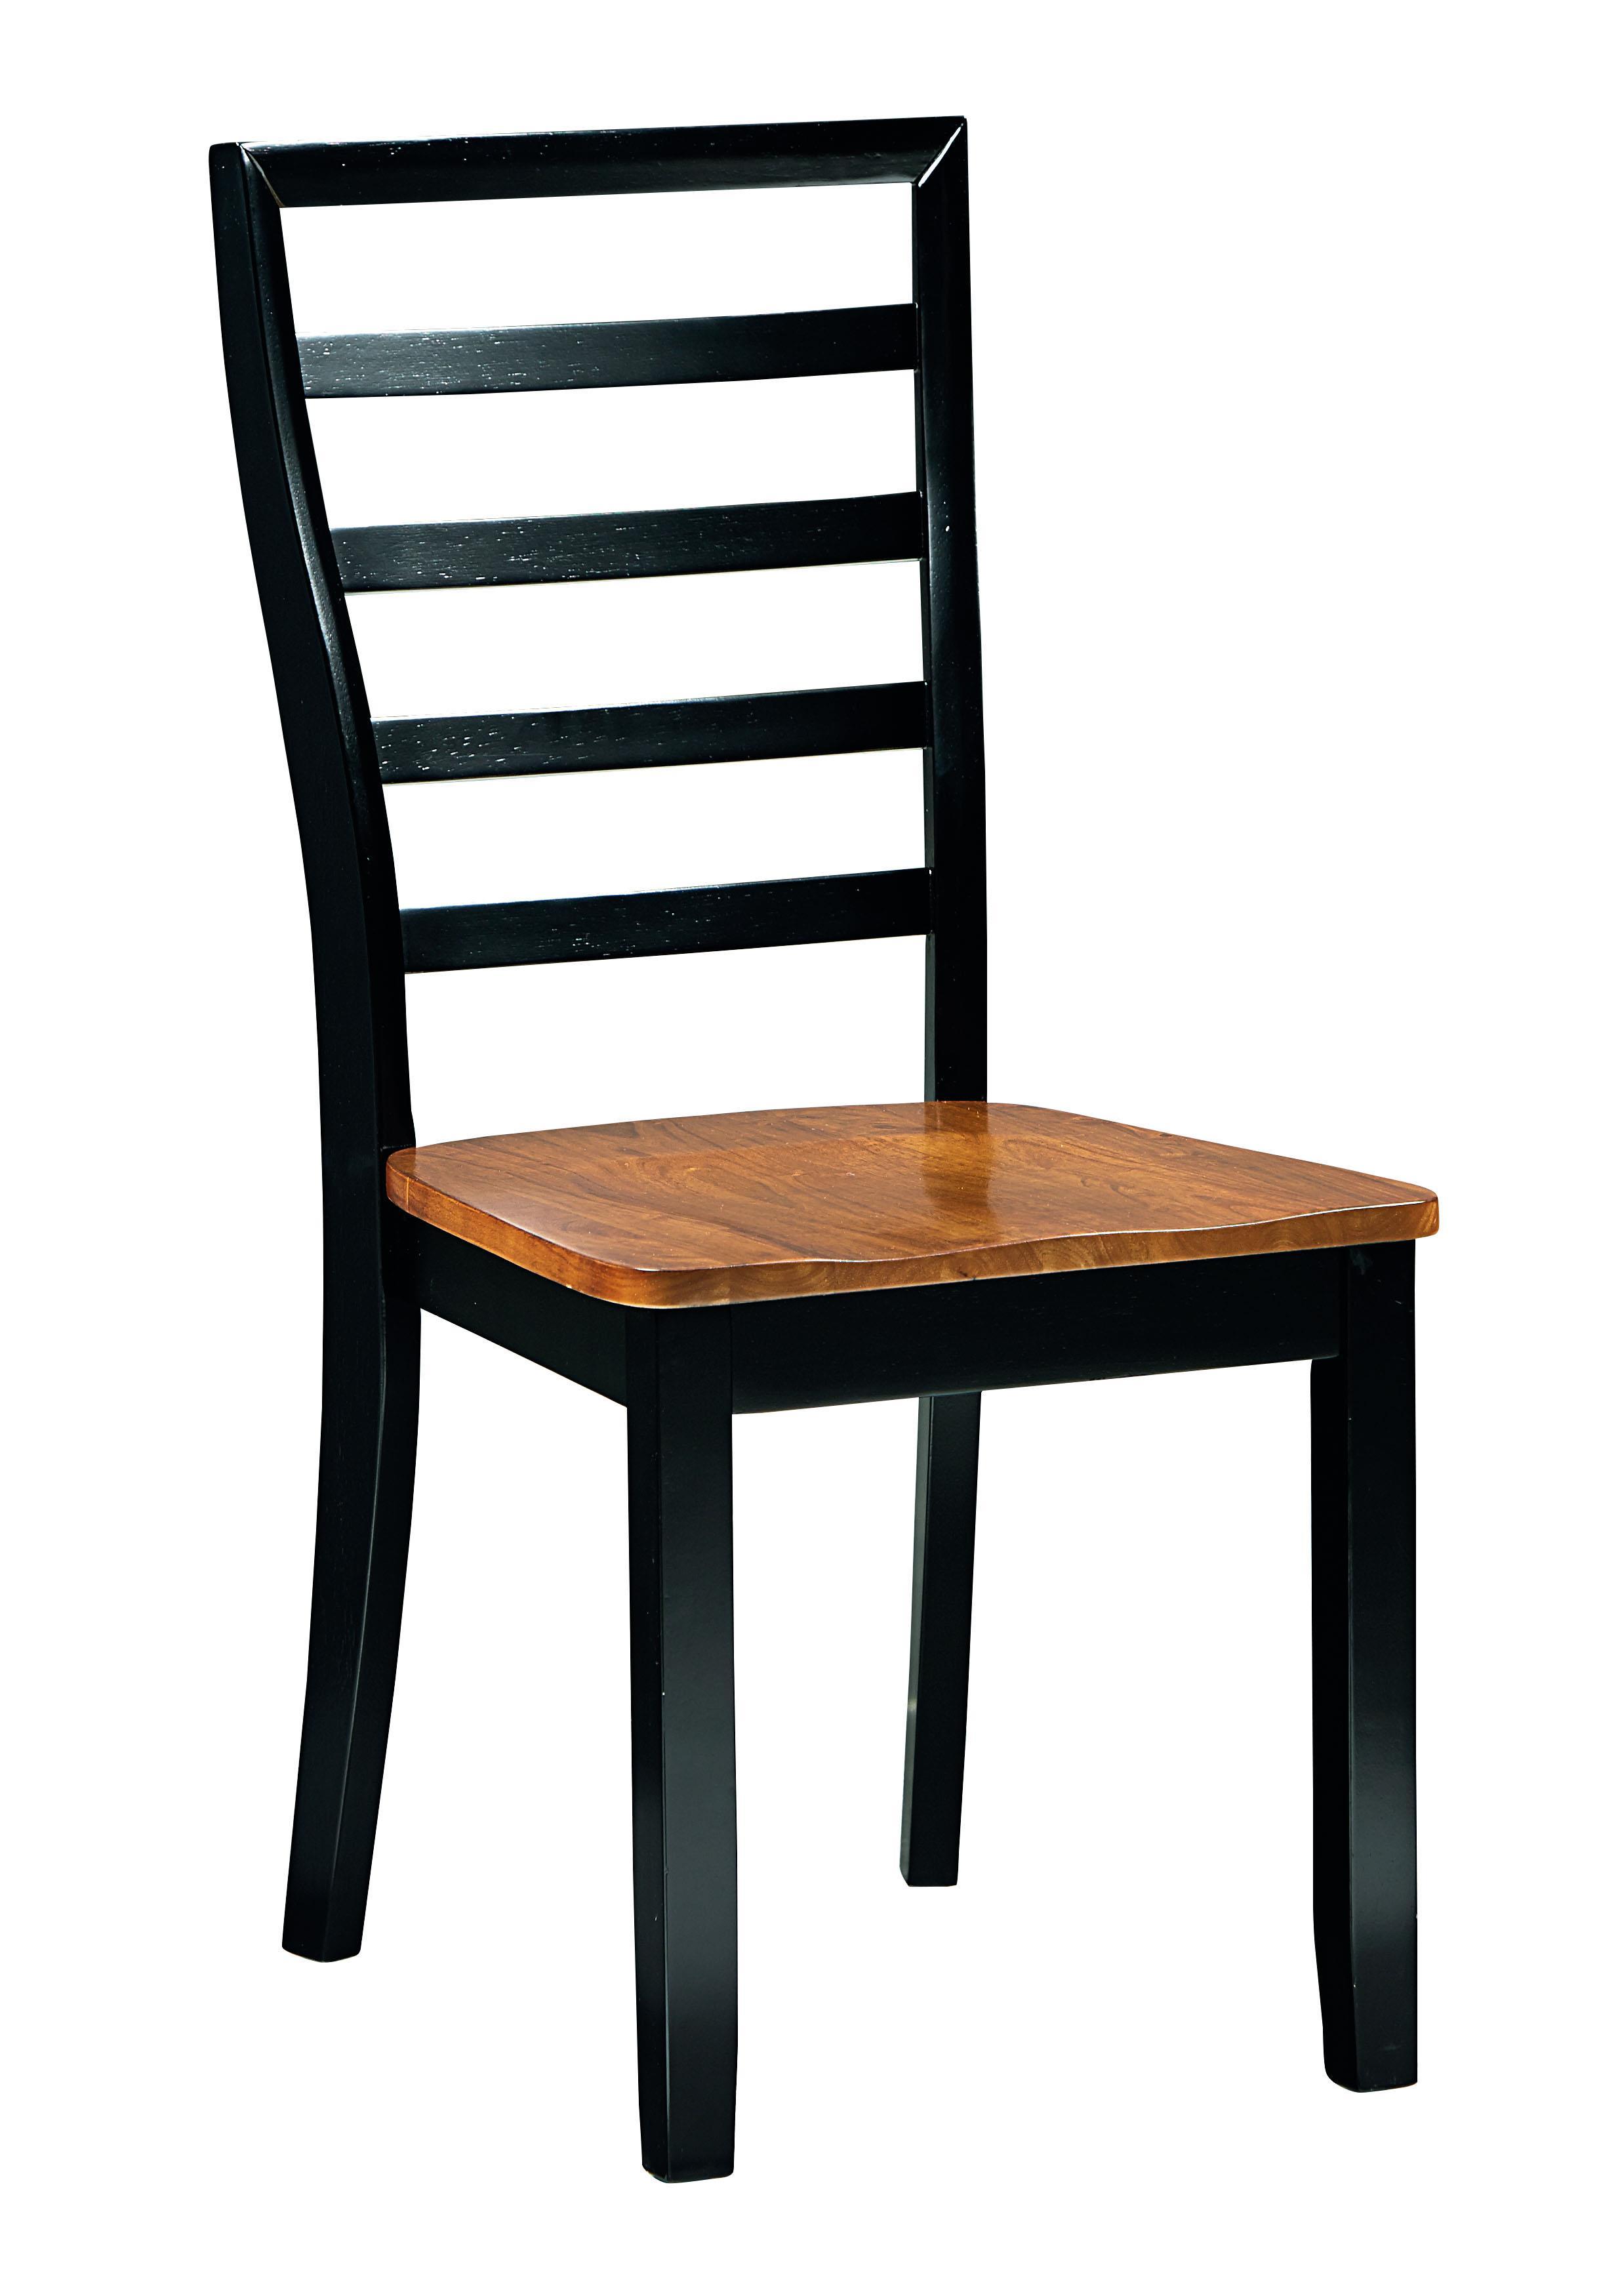 Standard Furniture Lexford Side Chair           - Item Number: 14924